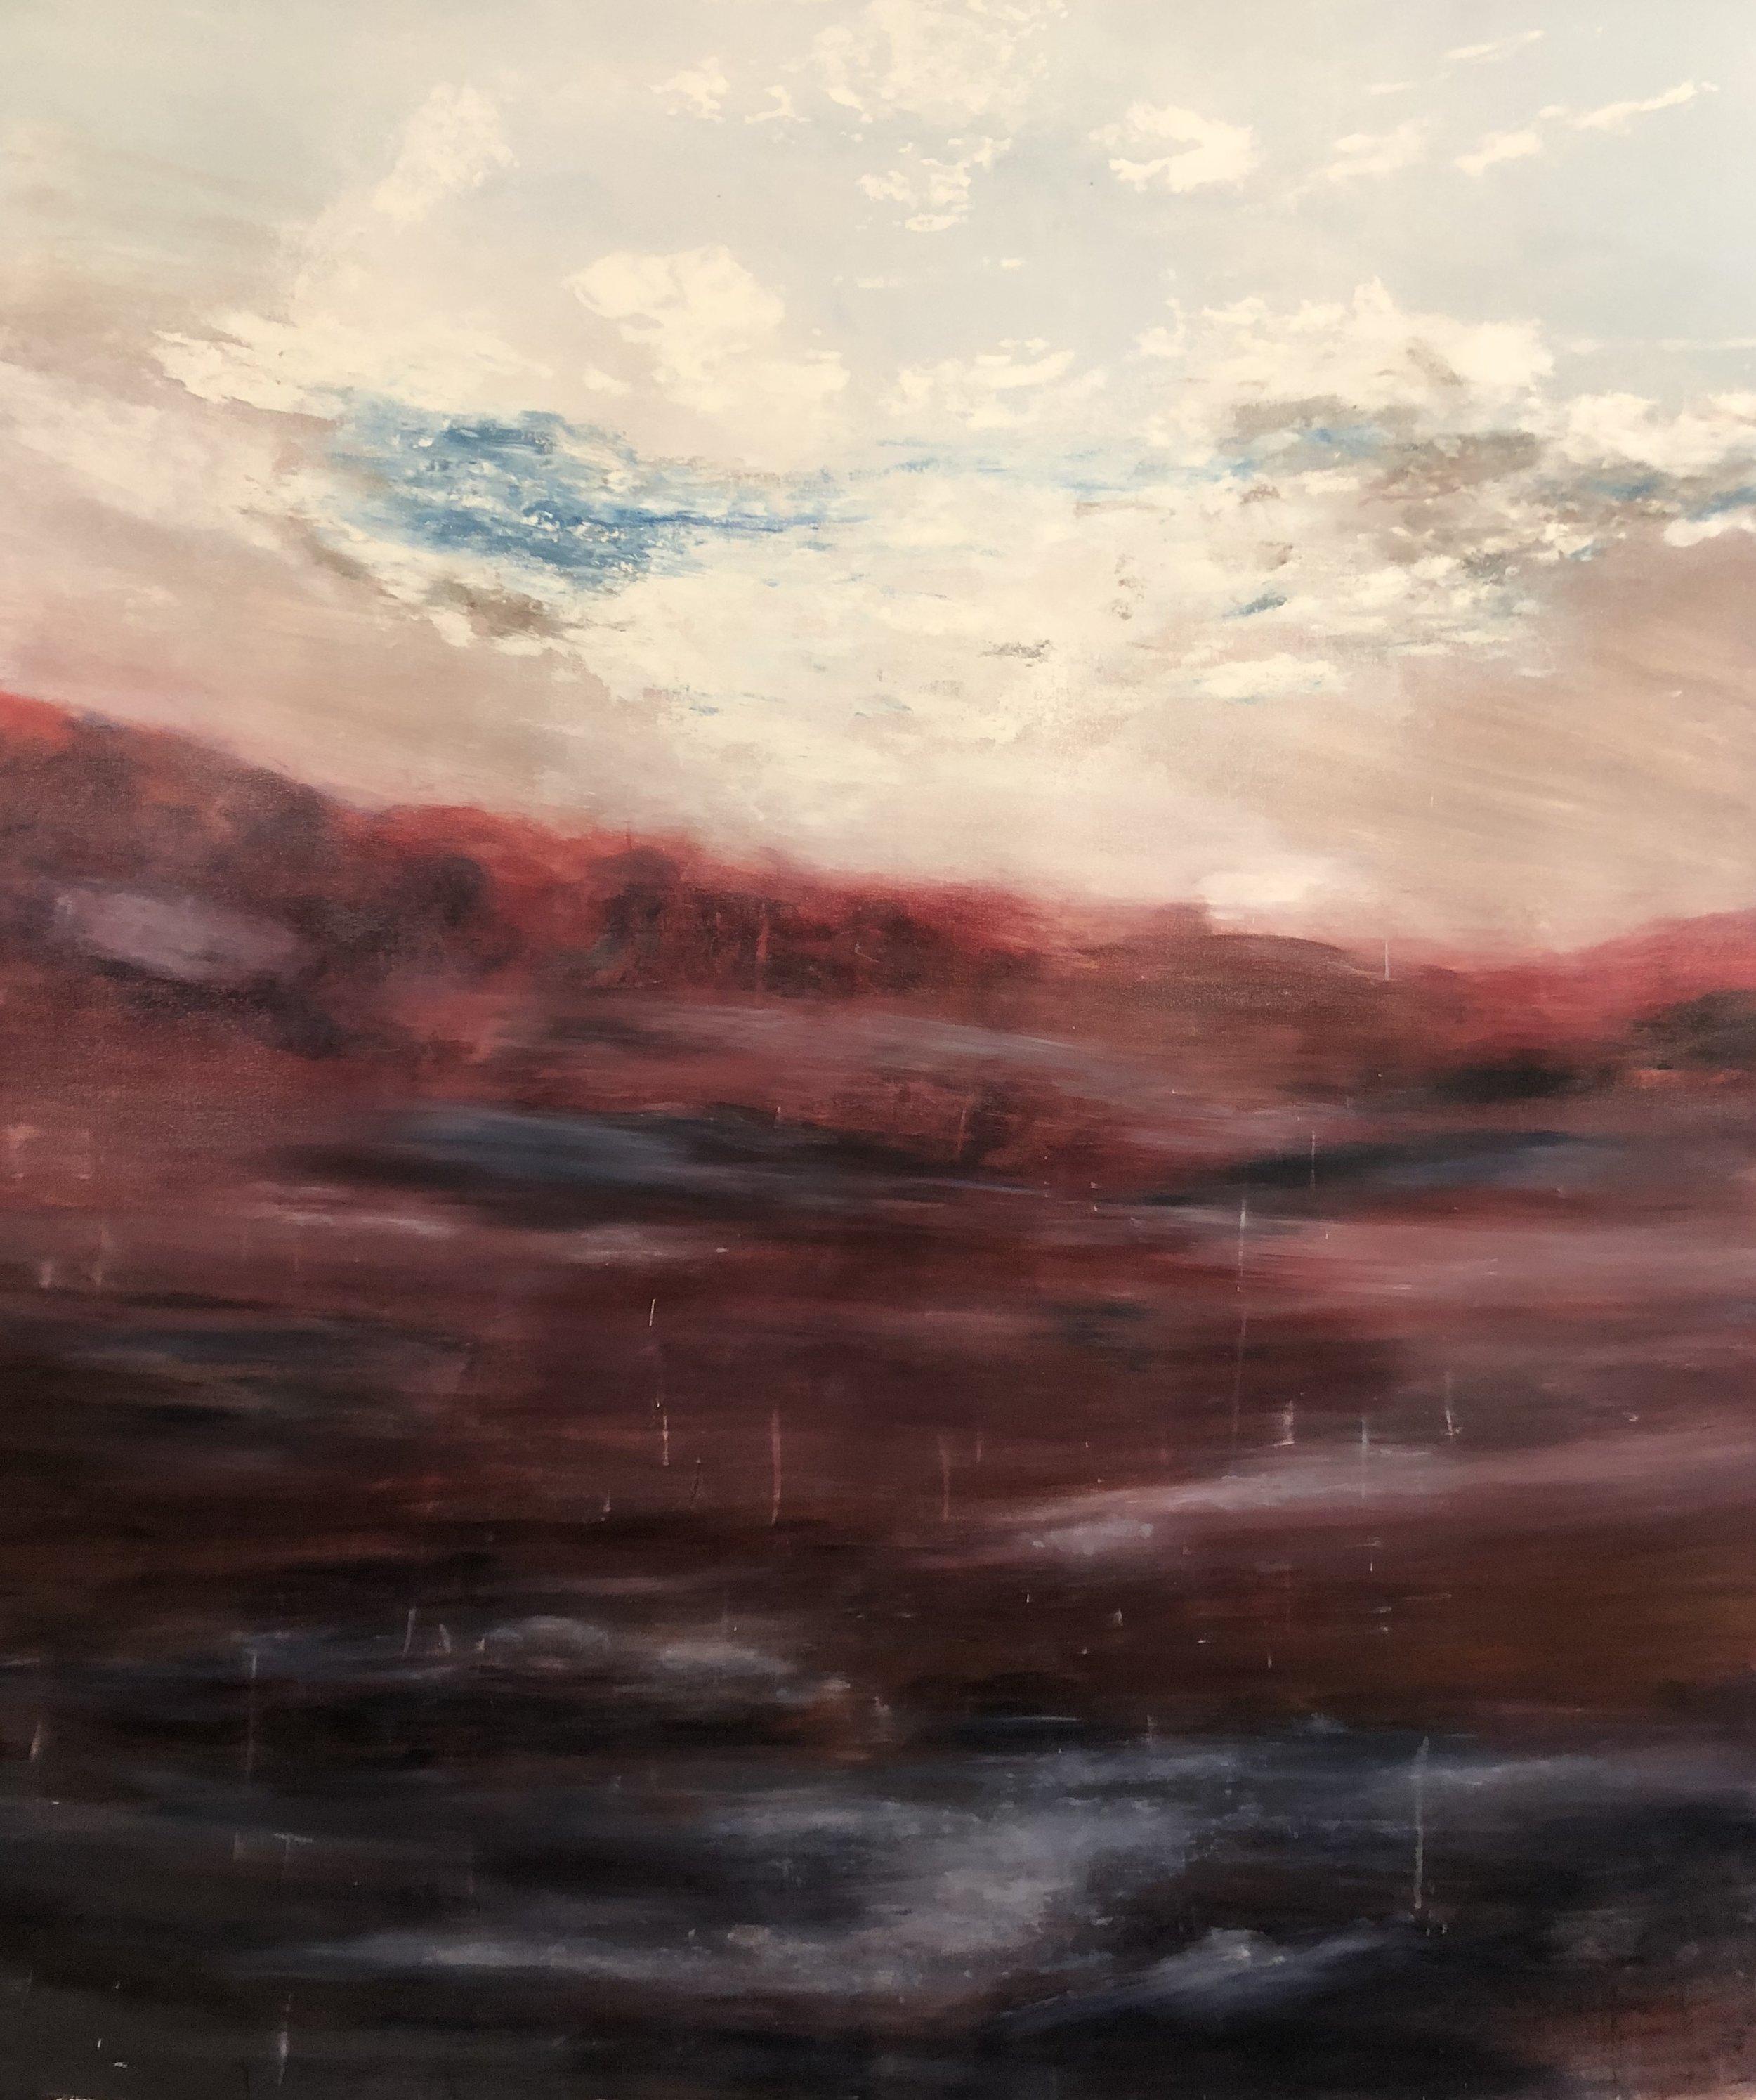 The Mist, 2015